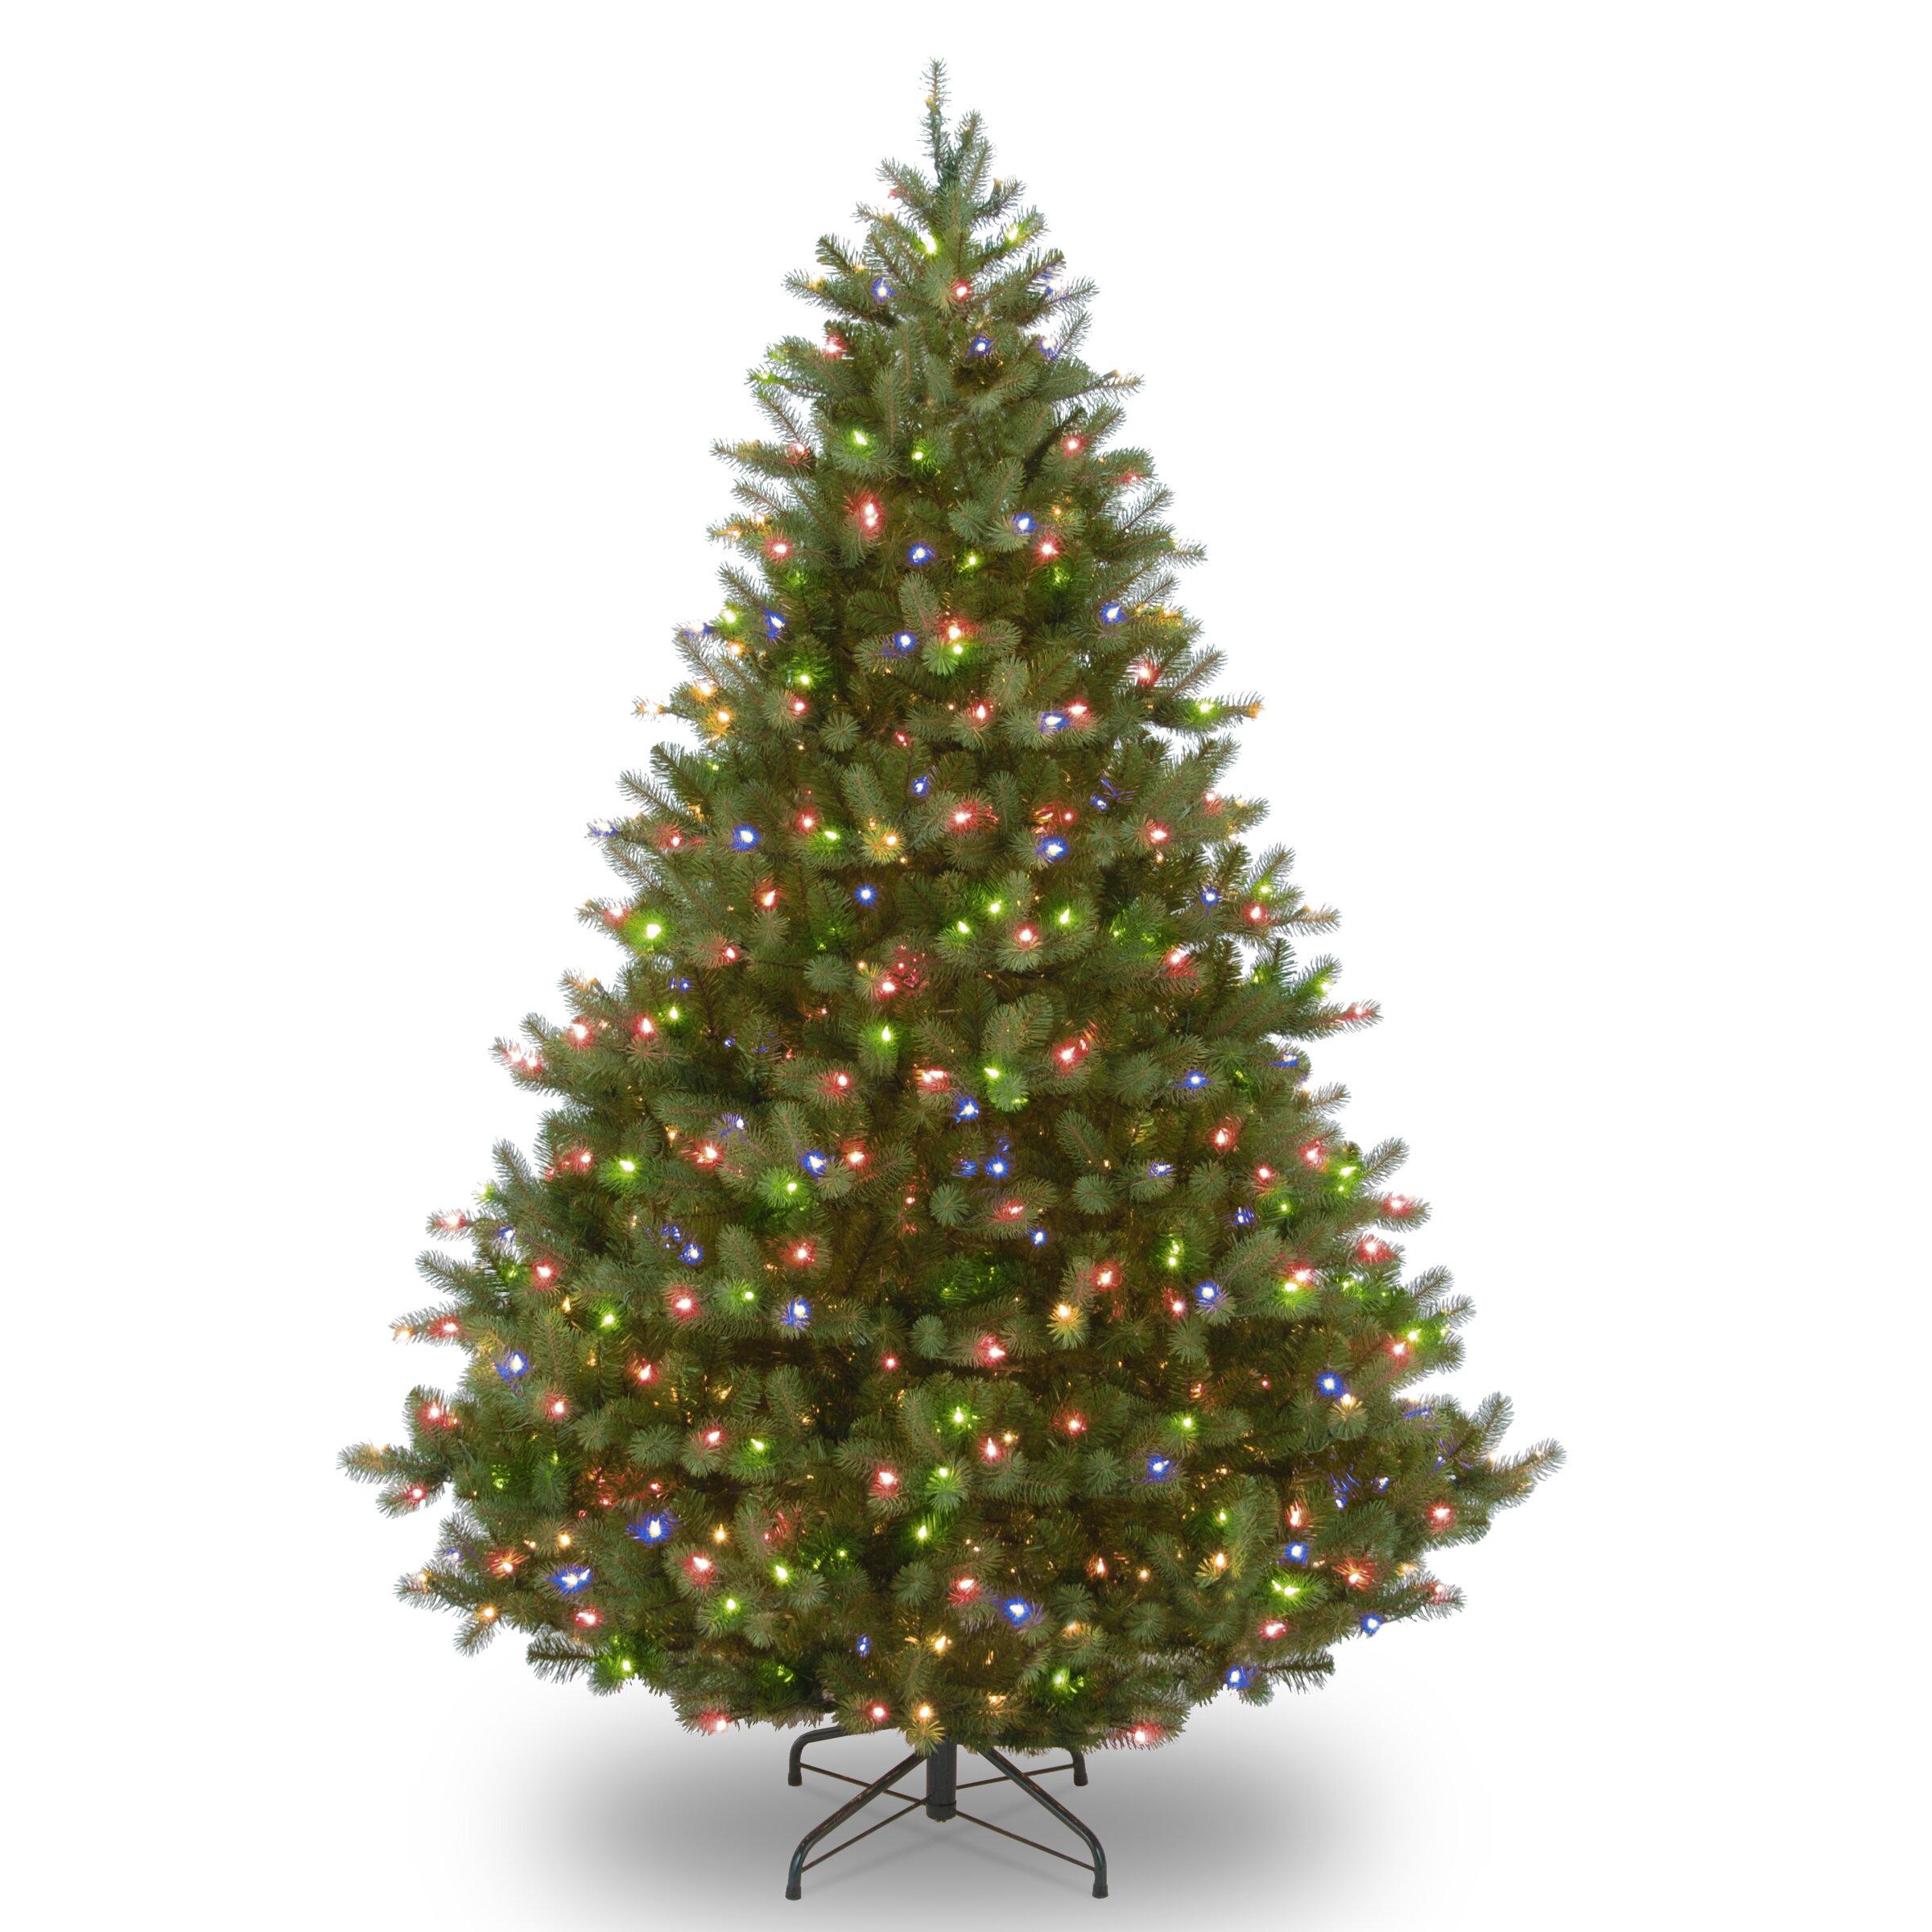 Douglas Fir Artificial Christmas Trees: National Tree Co. Downswept Douglas 9' Green Fir